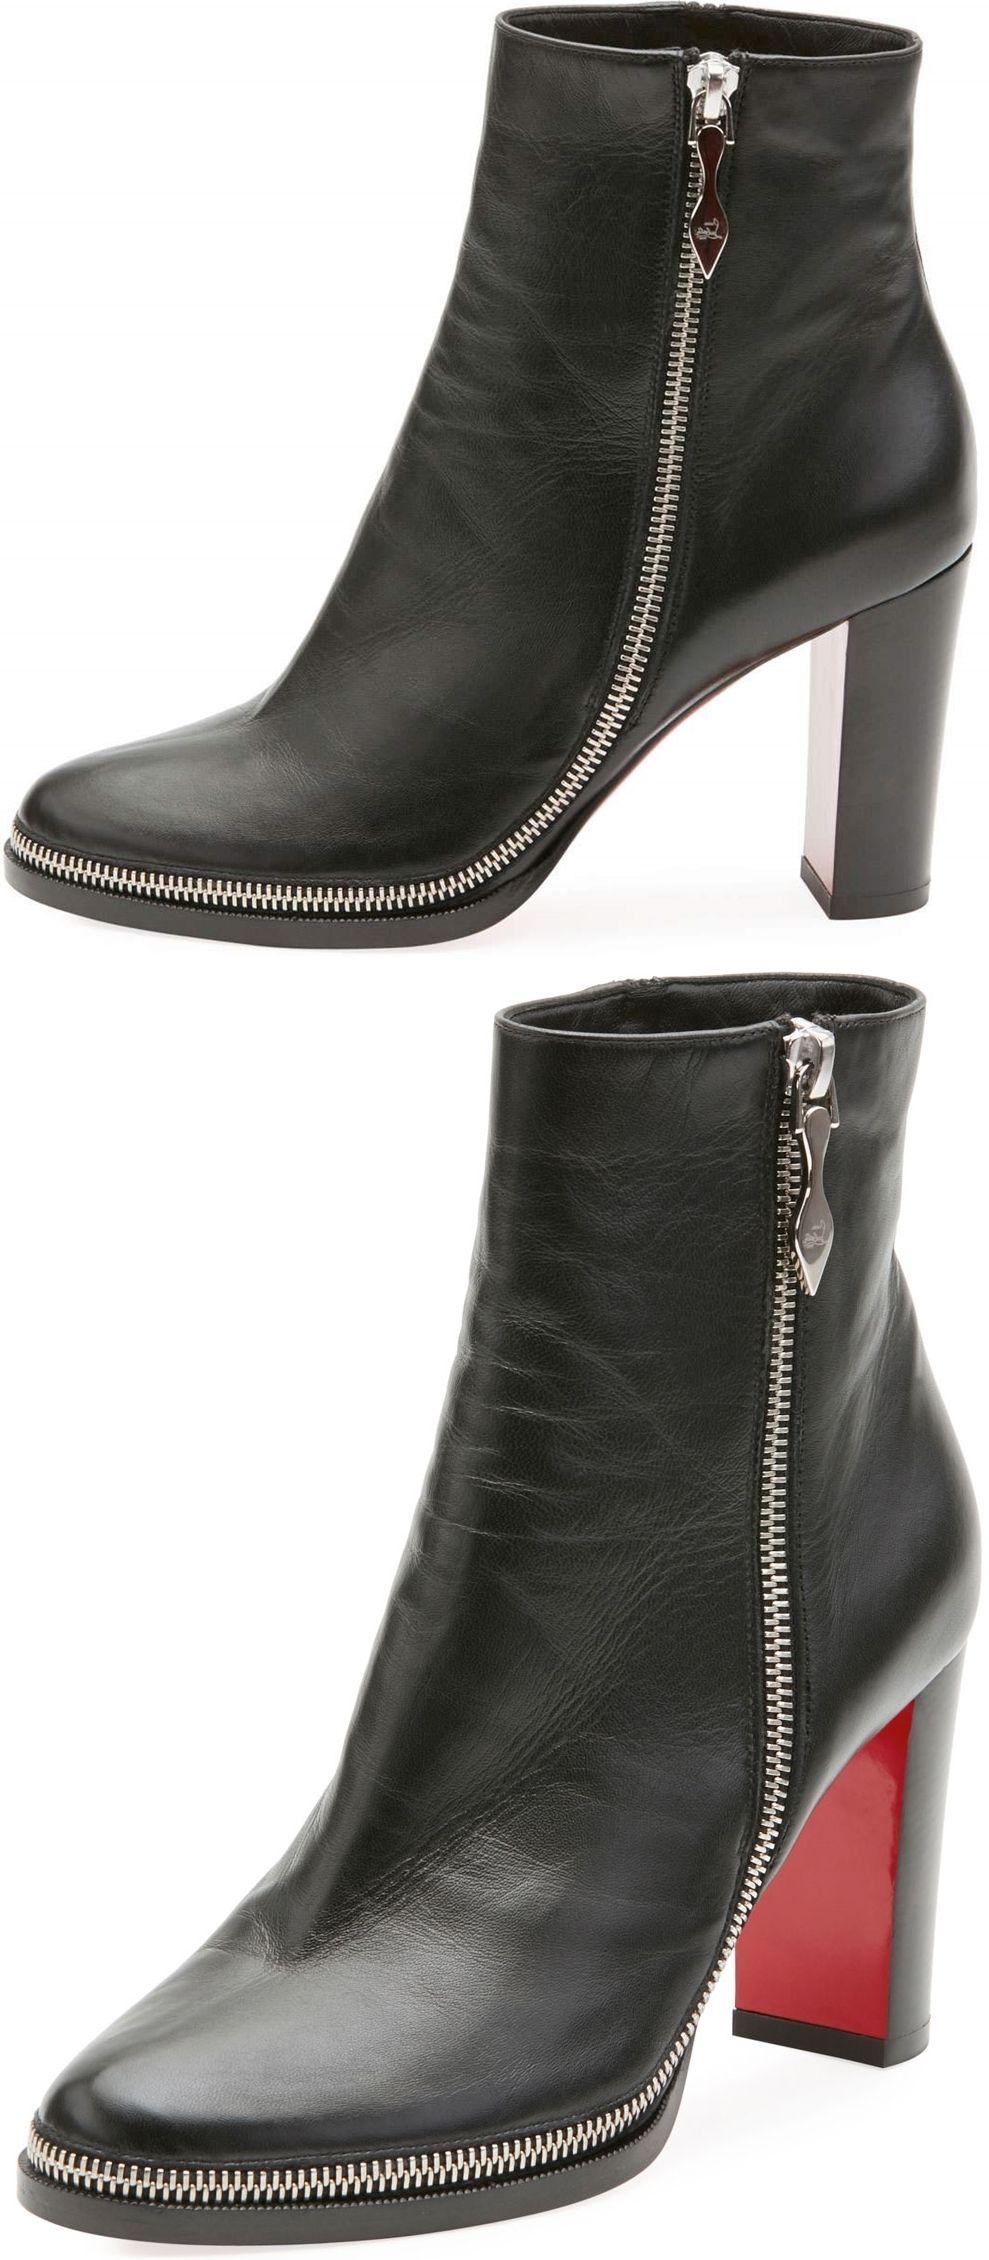 premium selection 7214f d3401 Christian Louboutin's black nappa leather Telezip ankle ...